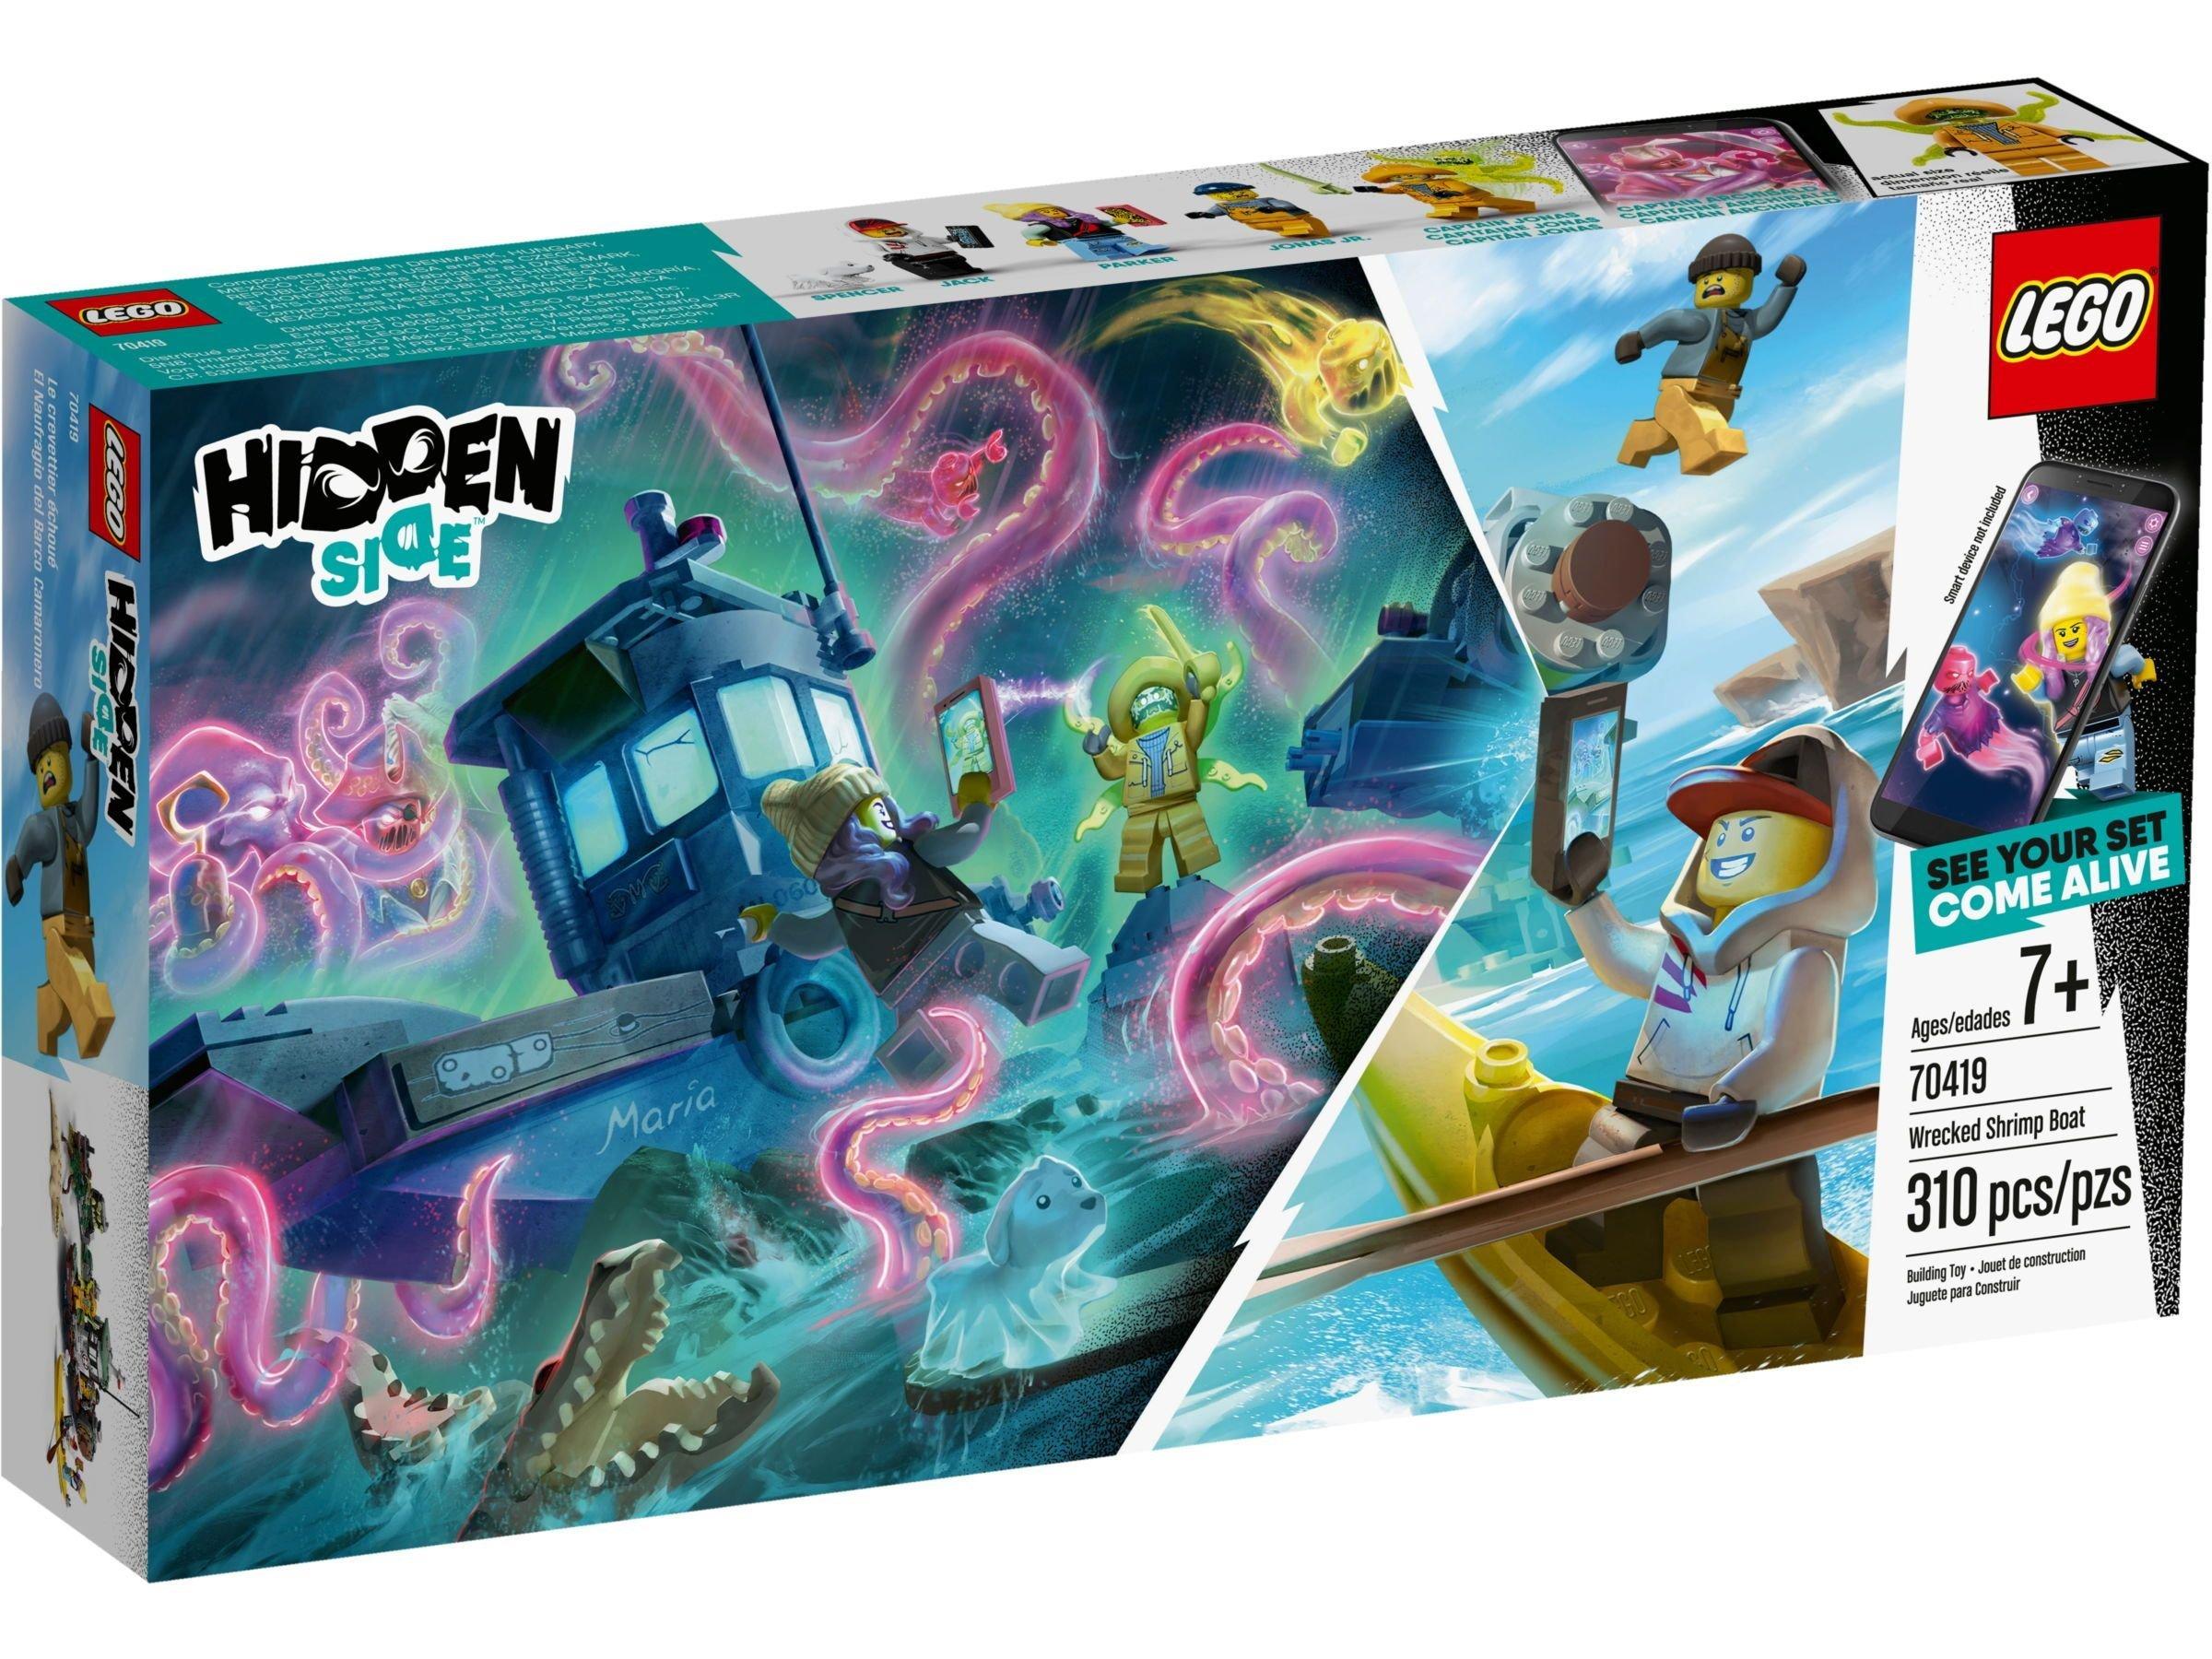 70419 LEGO® Hidden Side™ Sudužęs krevečių gaudymo laivas